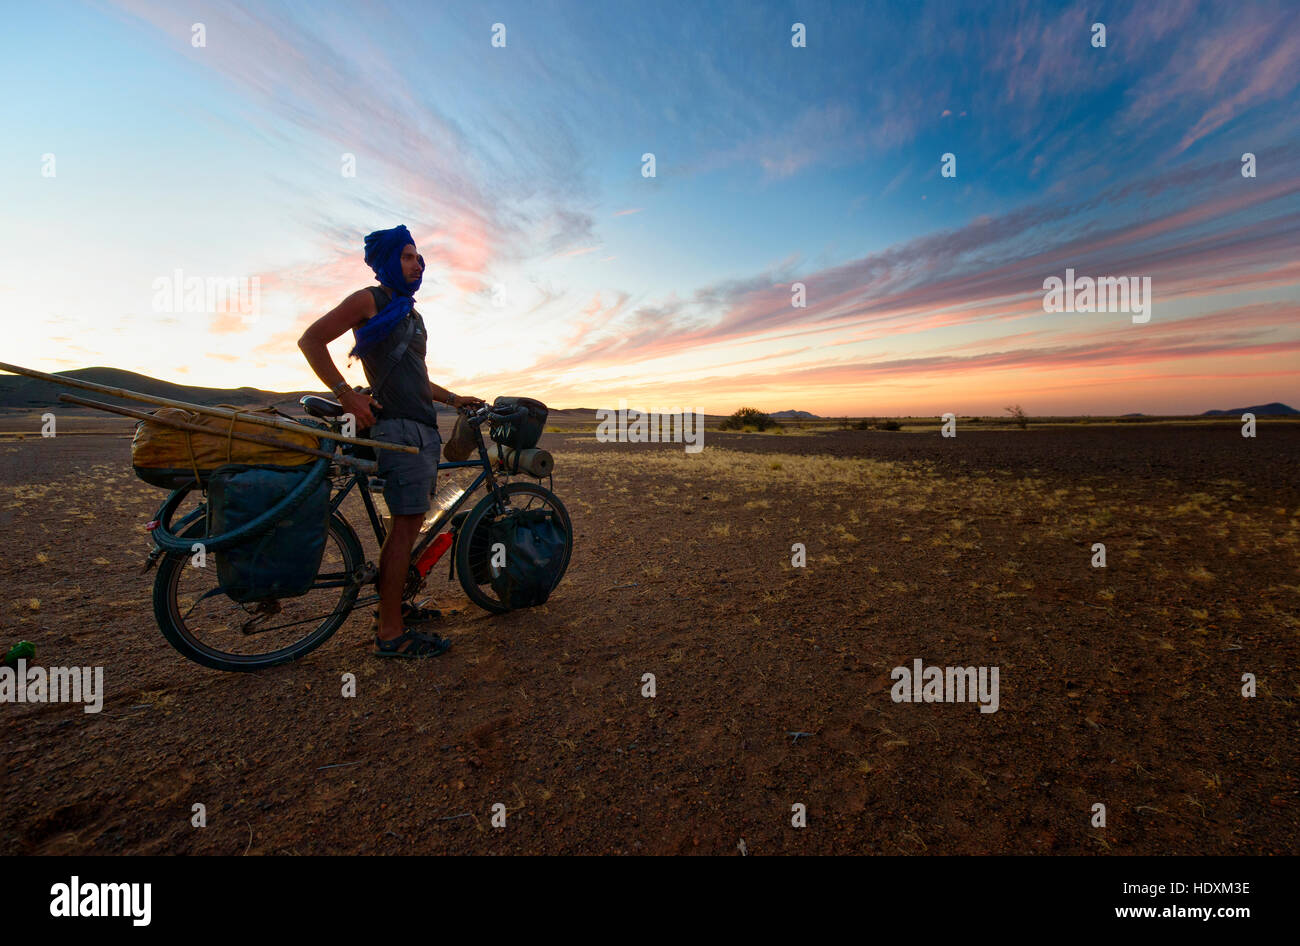 Cycling in the Adrar region of the Sahara desert, Mauritania Stock Photo